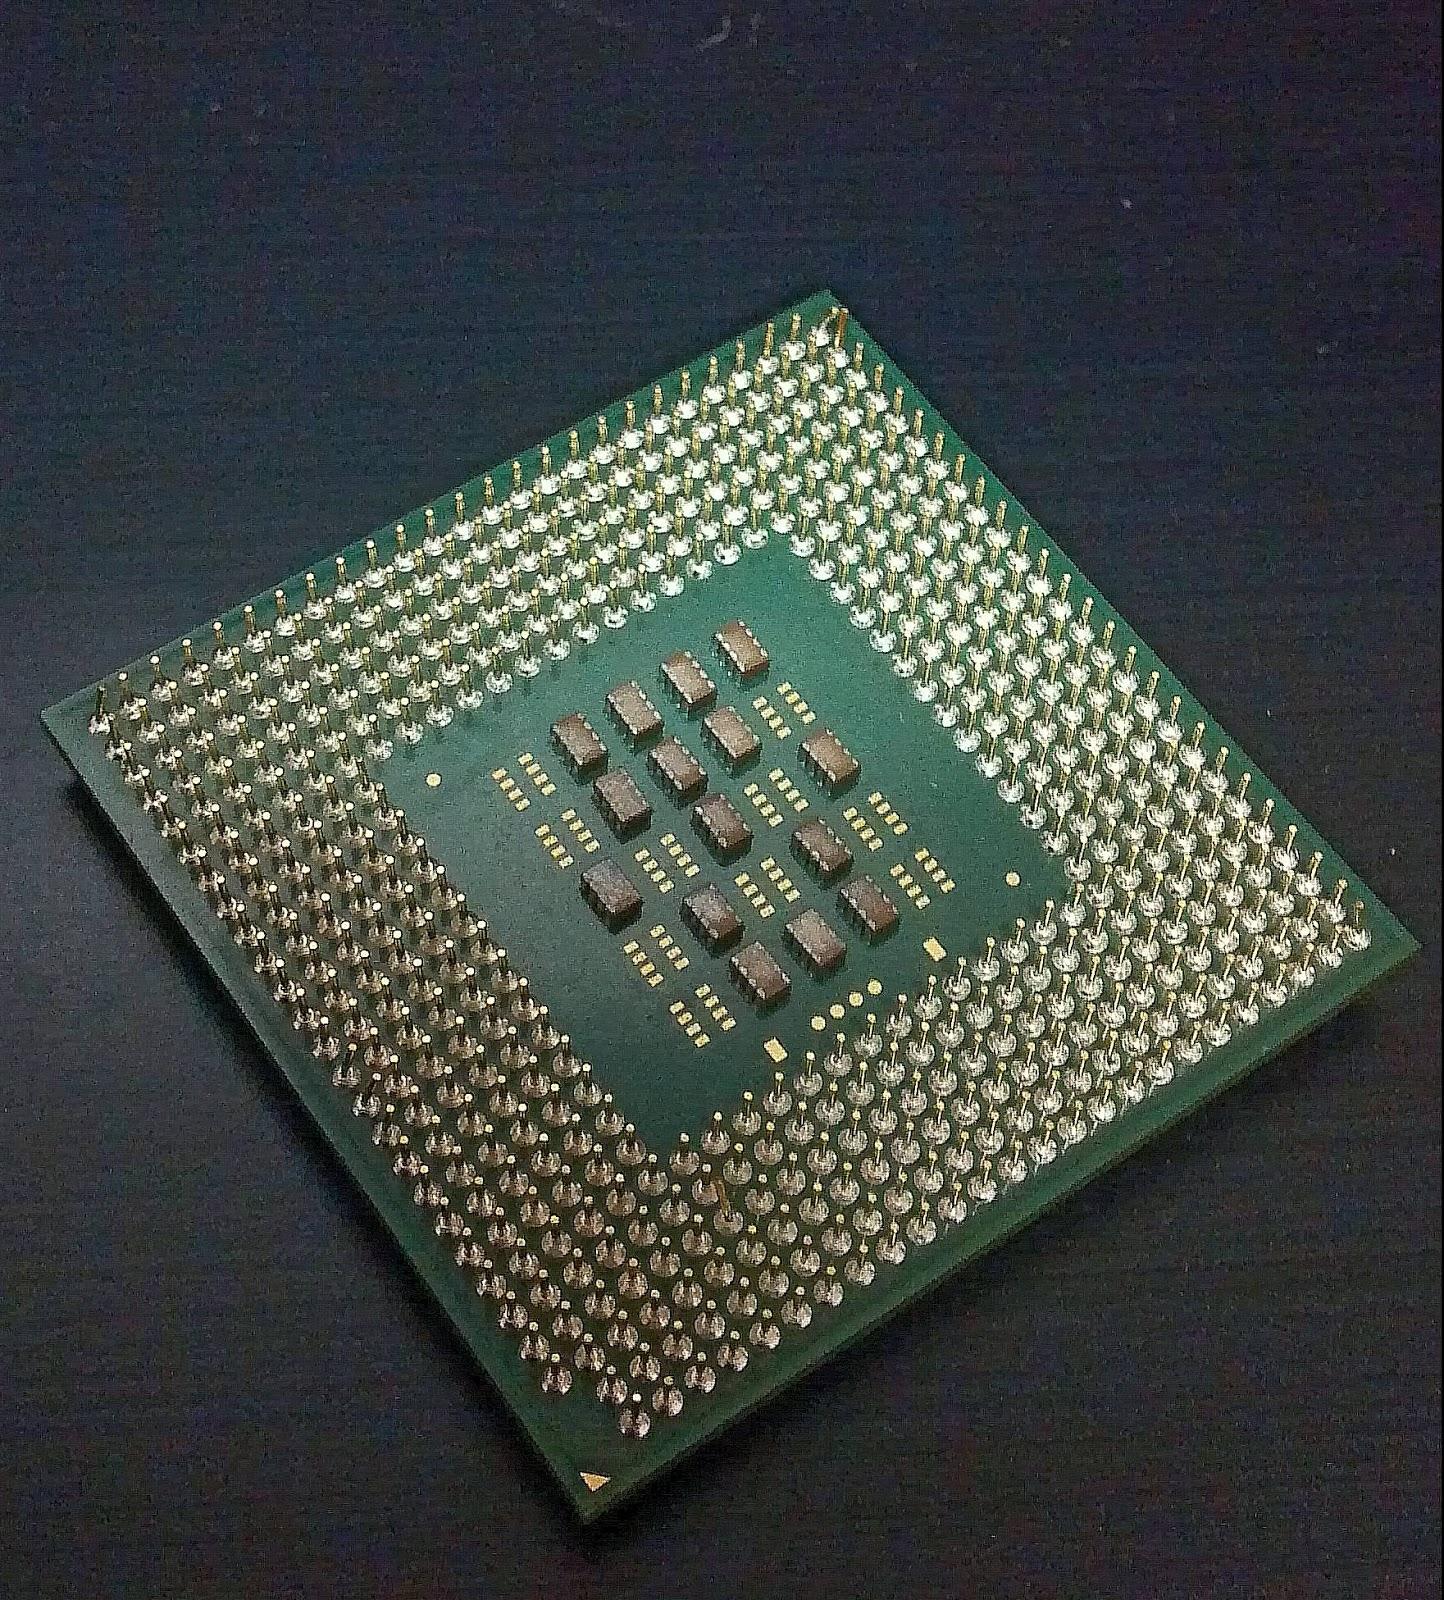 Modern Microprocessor ...